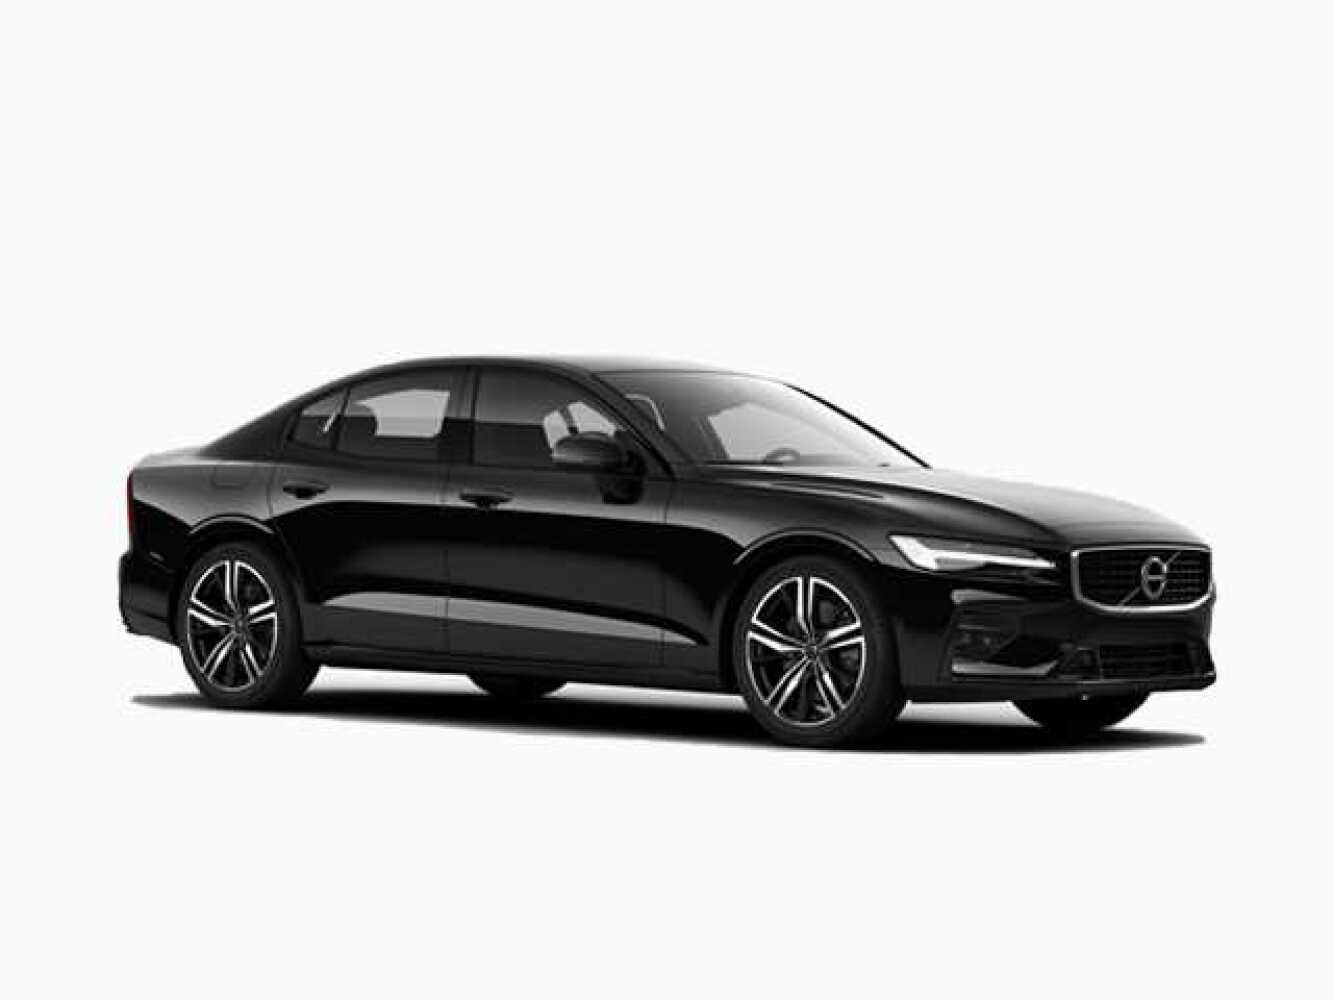 New Volvo S60 2.0 T5 R DESIGN Plus 4dr Auto Petrol Saloon ...